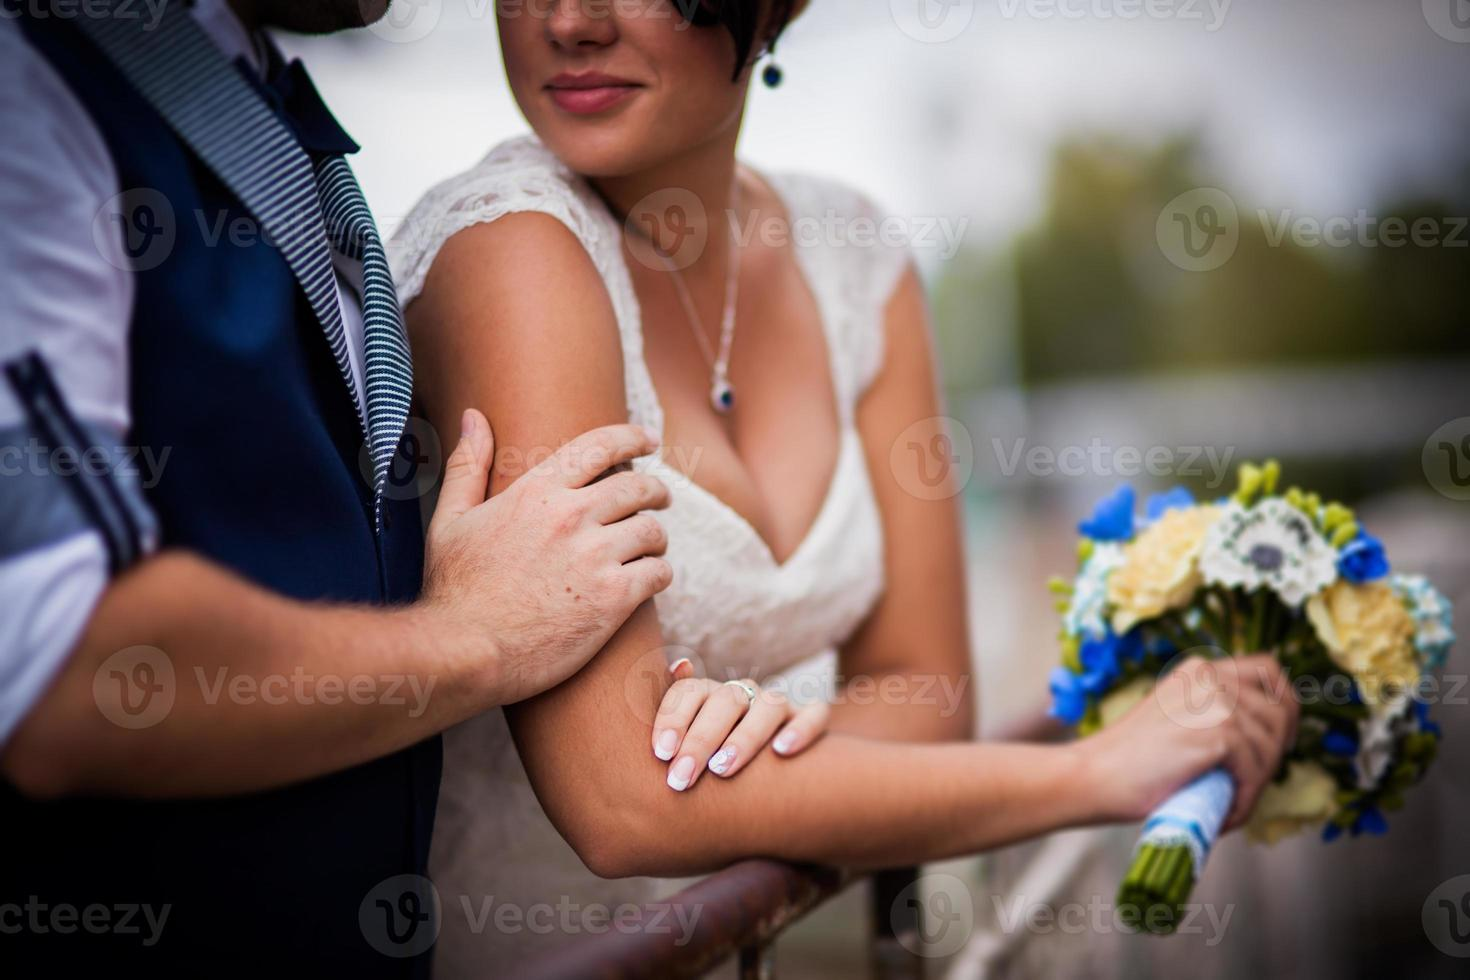 casamento barco foto